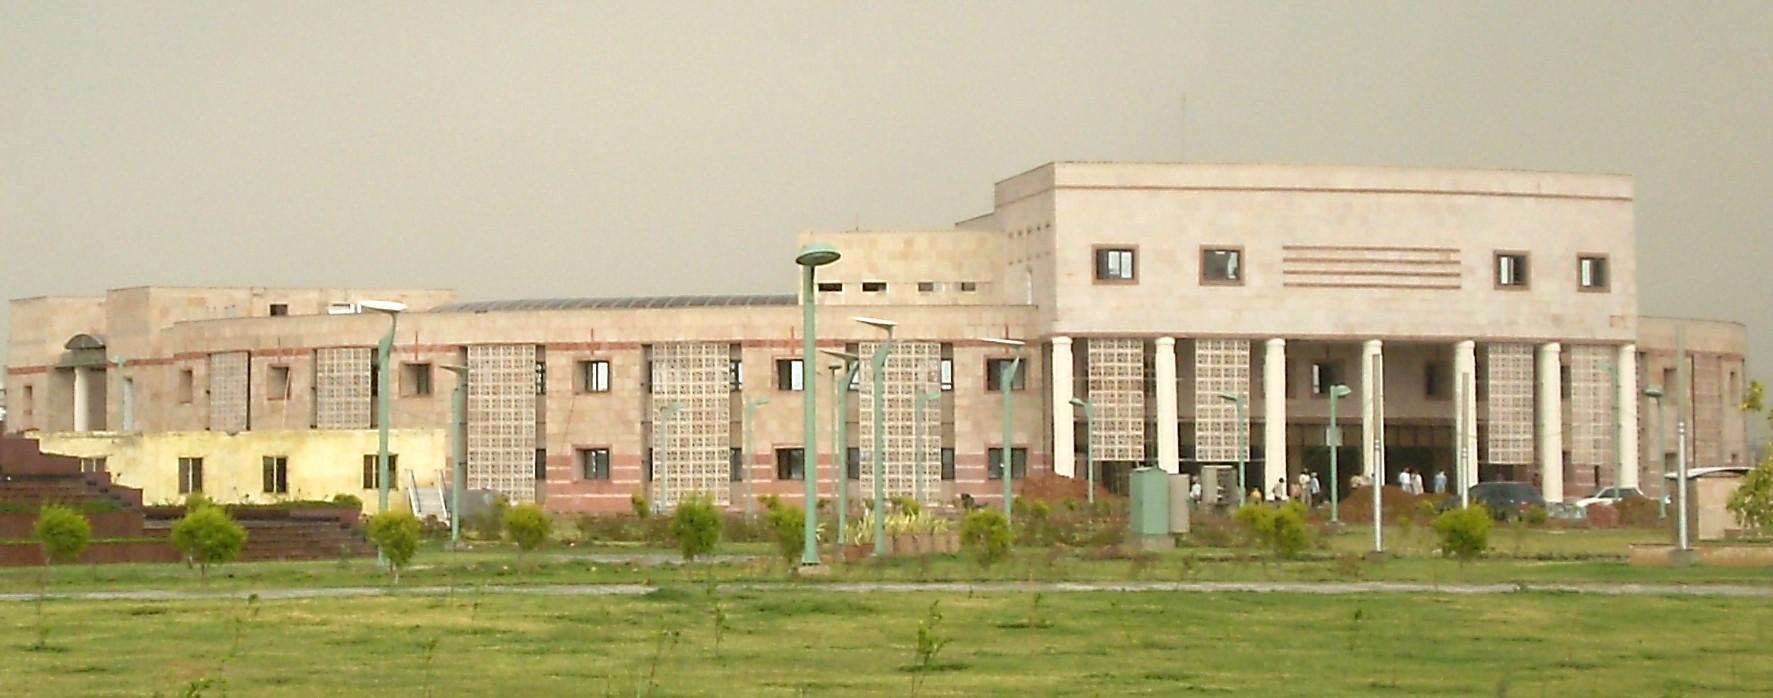 School of Humanities and Social Sciences, Gautam Buddha University Image